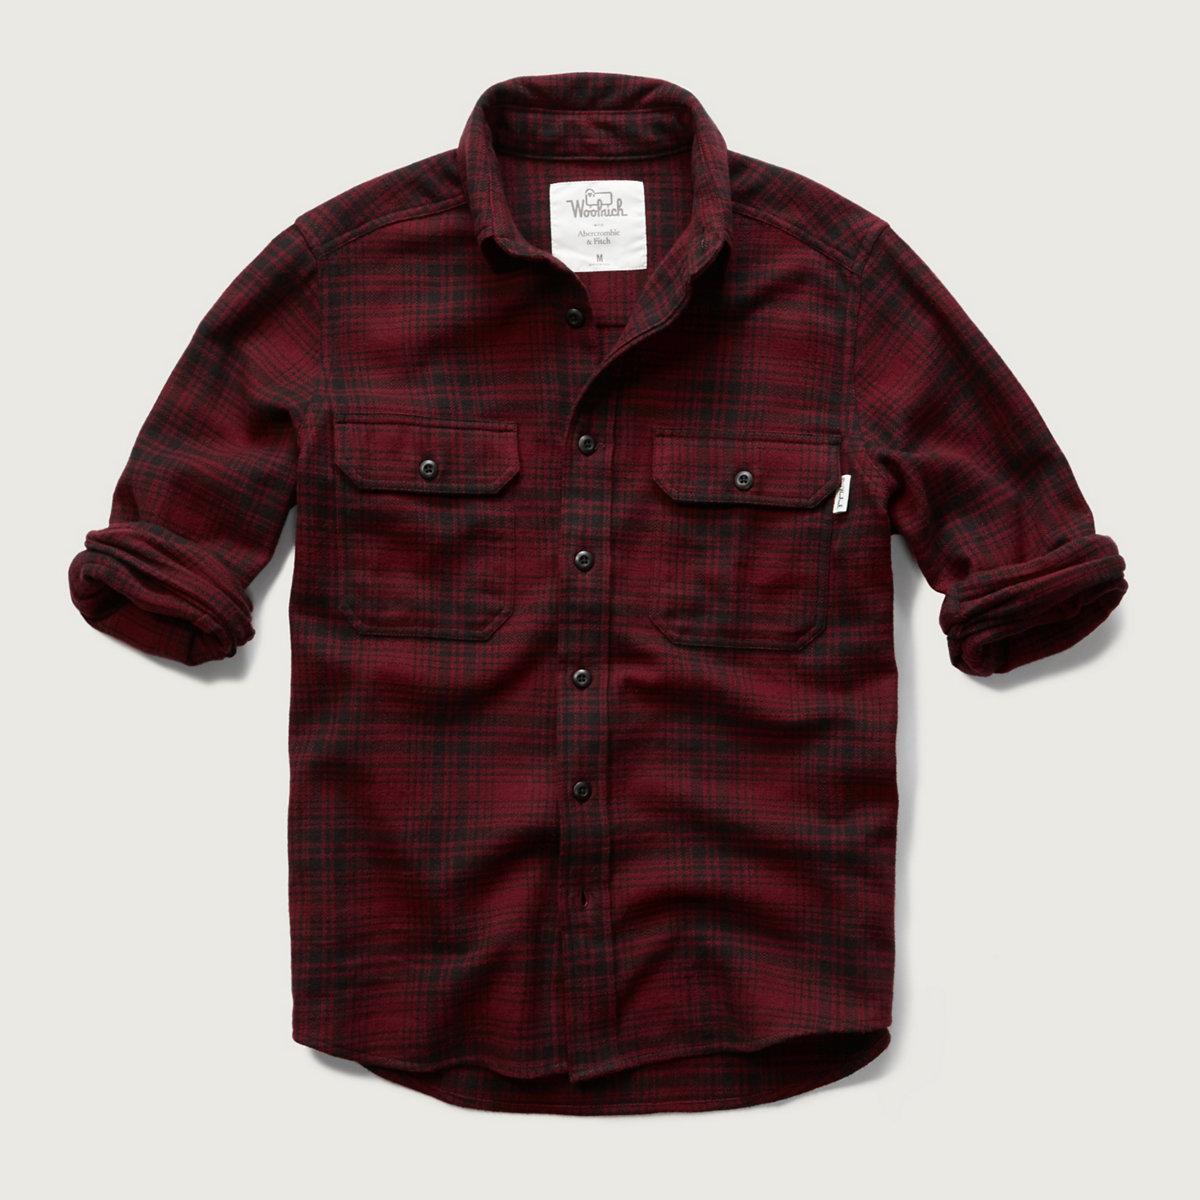 Woolrich Plaid Flannel Shirt